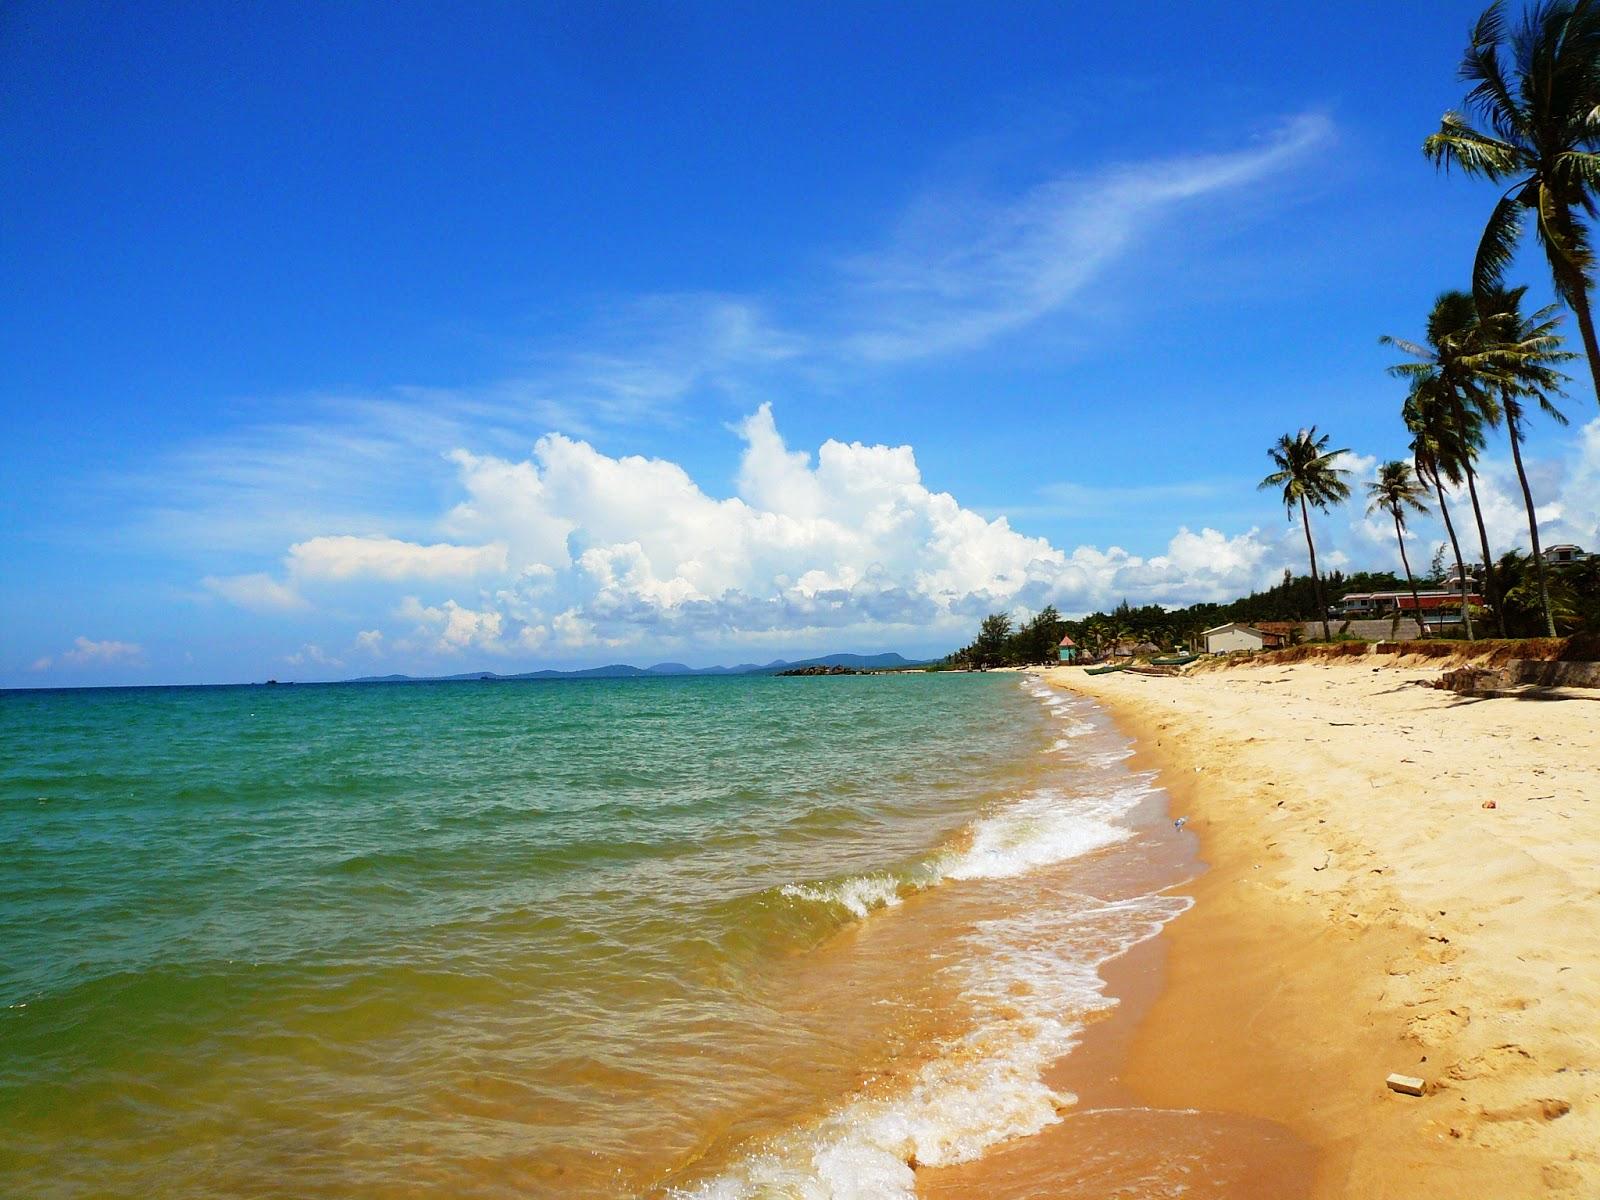 О. фукуок фото пляжа